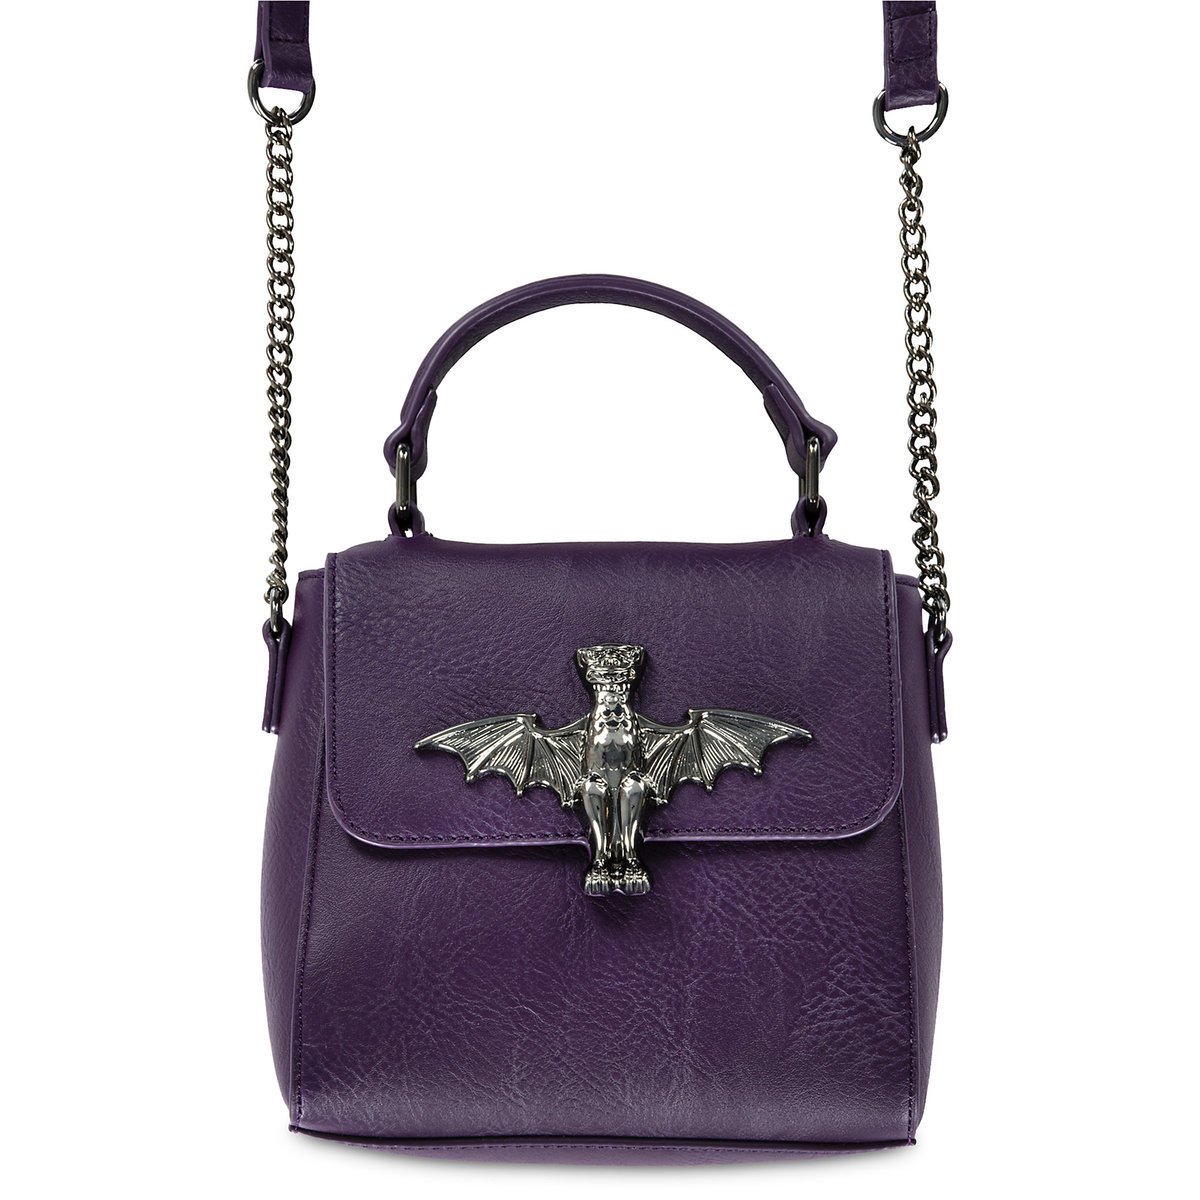 Must Have Disney Handbags and Accessories!  DisneyStyle 5 c40085b3cc210